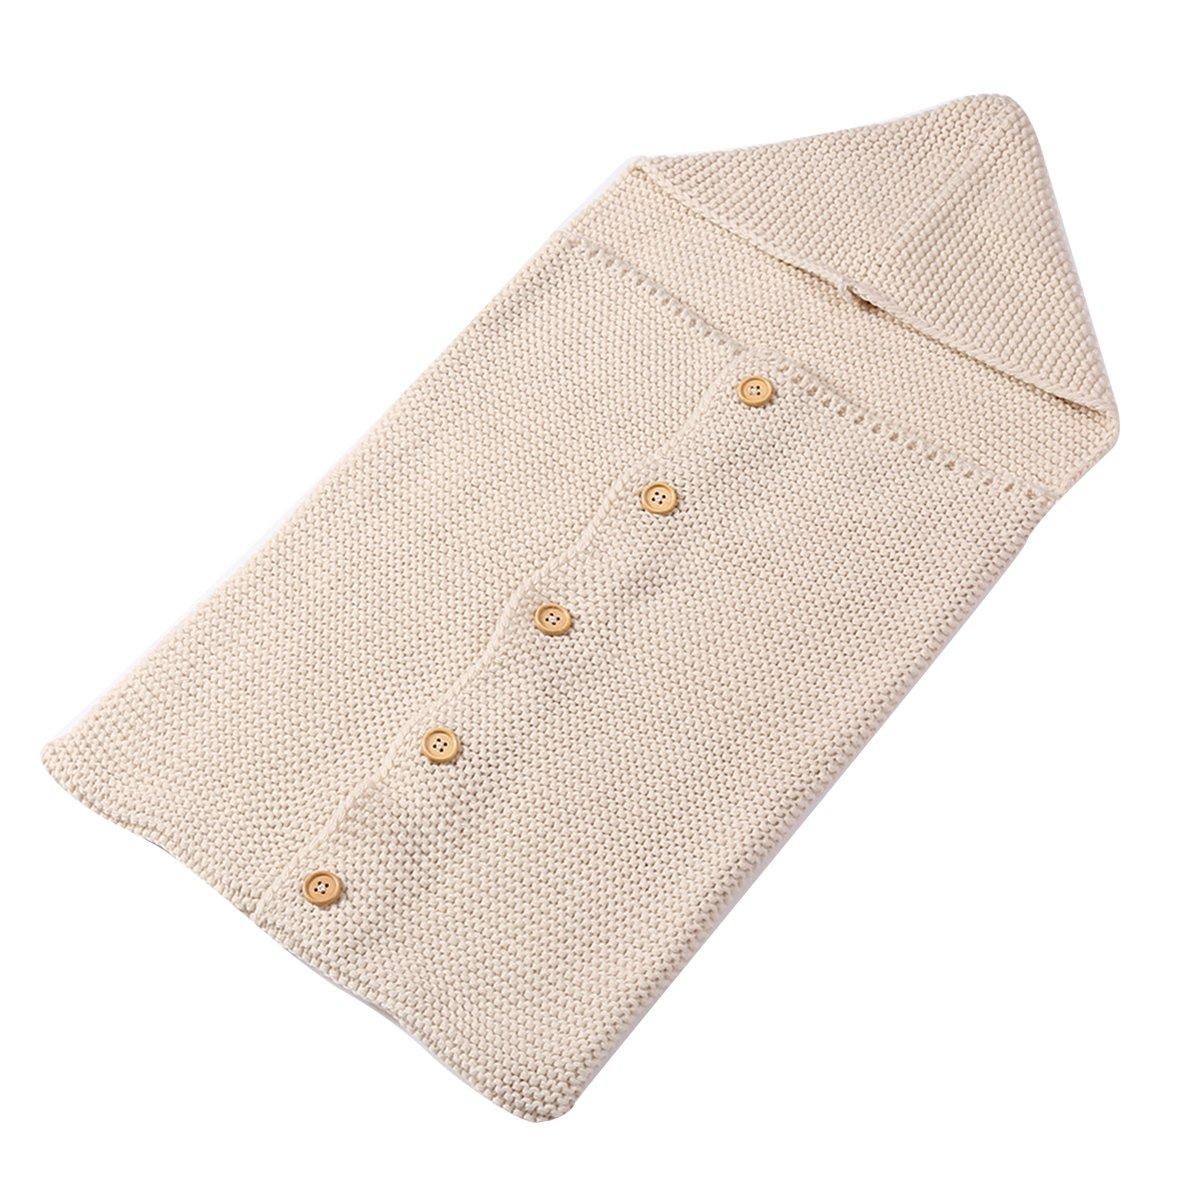 Puseky Newborn Infant Baby Knit Wool Winter Sleep Sack Swaddle Blanket Wrap Sleeping Bag (Black) 561465465